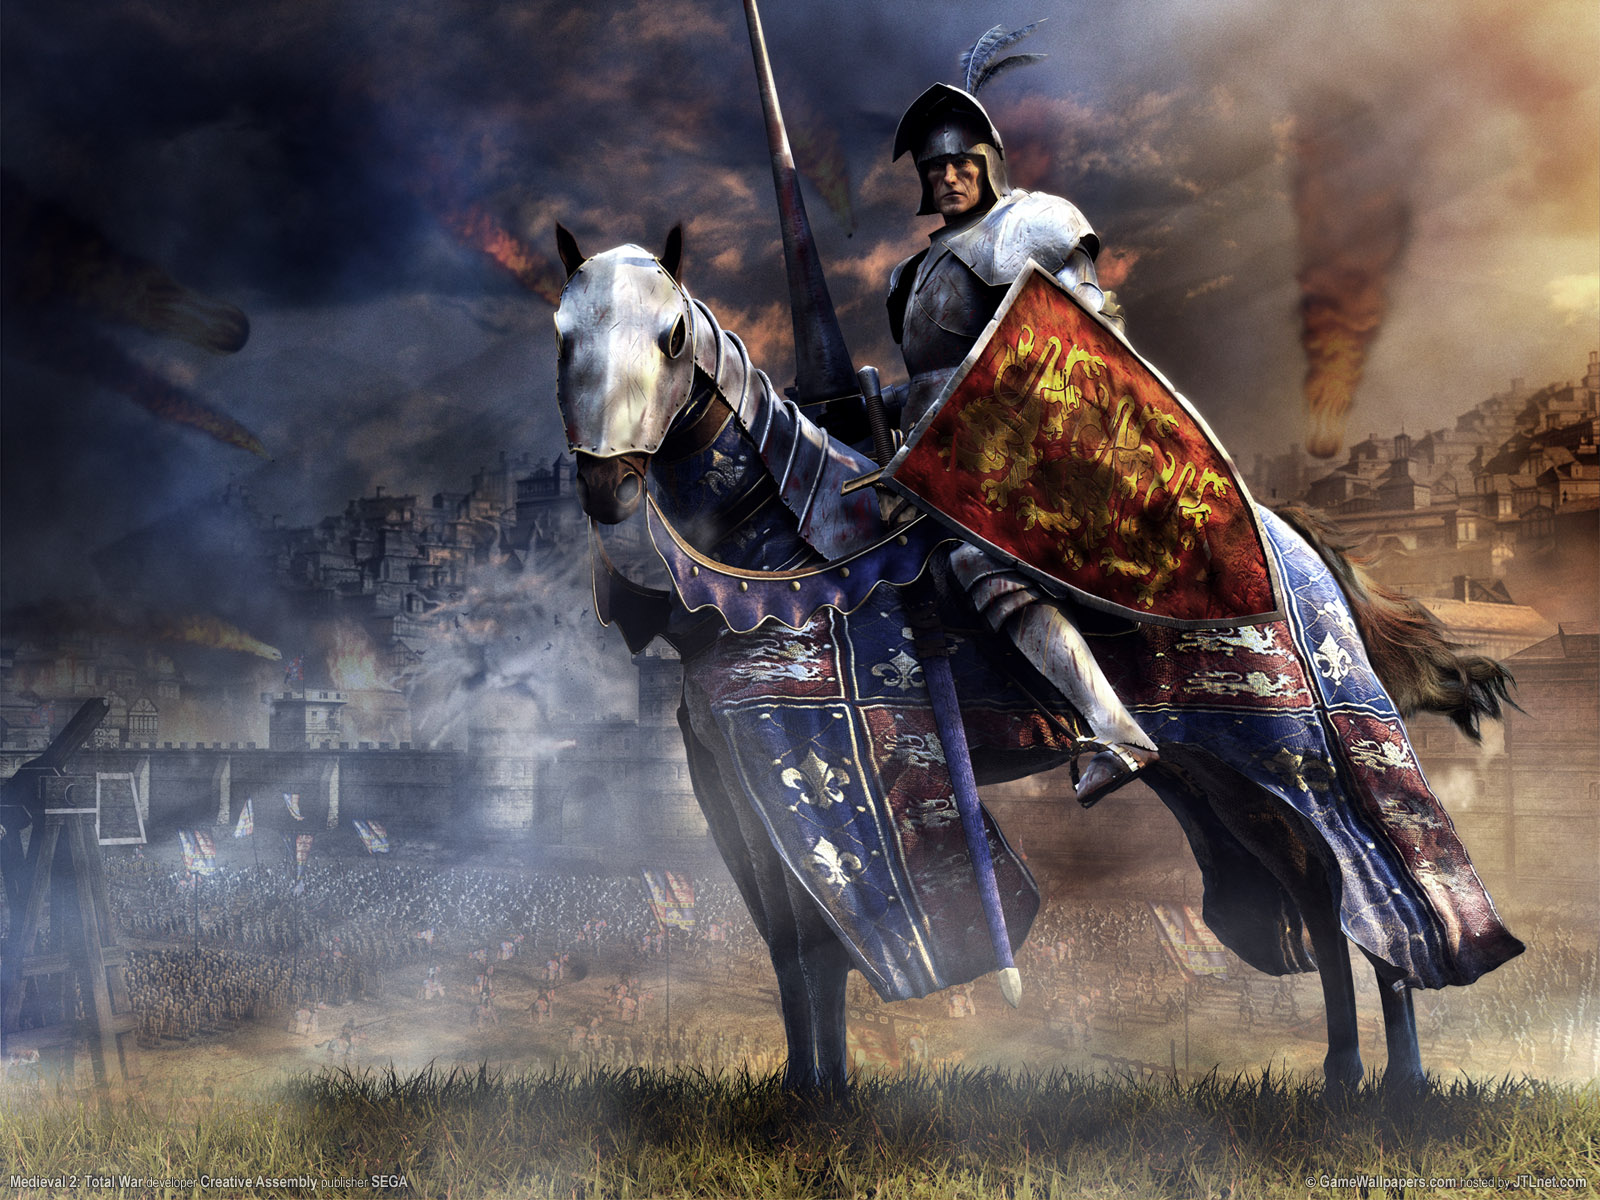 medieval 23a total war wallpapers 19438 1600x1200jpg 1600x1200